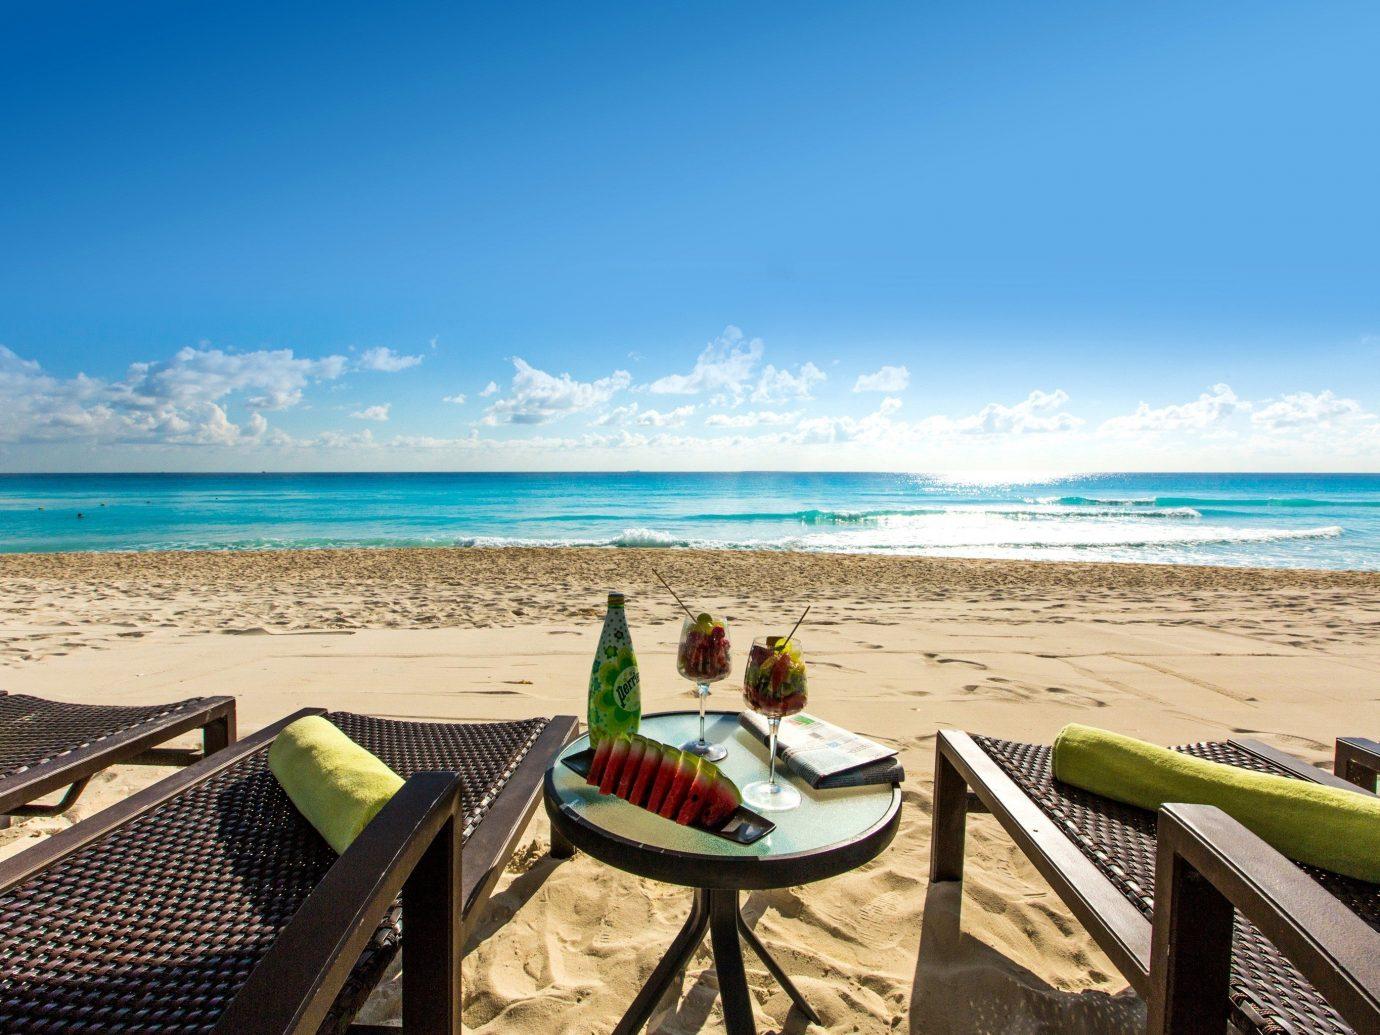 Hotels sky water outdoor Beach shore Sea leisure body of water Ocean Nature vacation horizon Coast sand caribbean bay wave